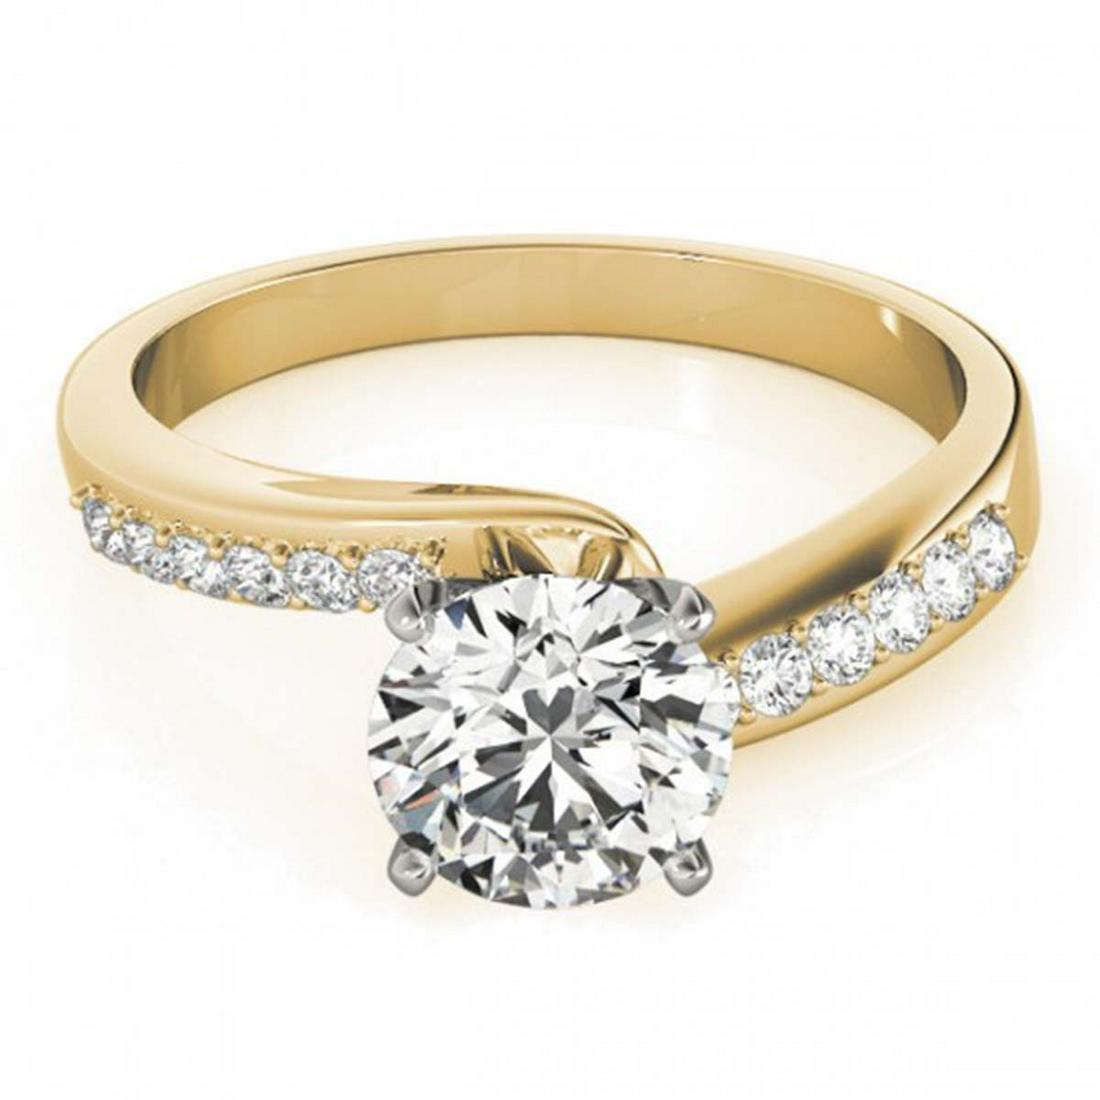 0.91 ctw VS/SI Diamond Bypass Ring 14K Yellow Gold -